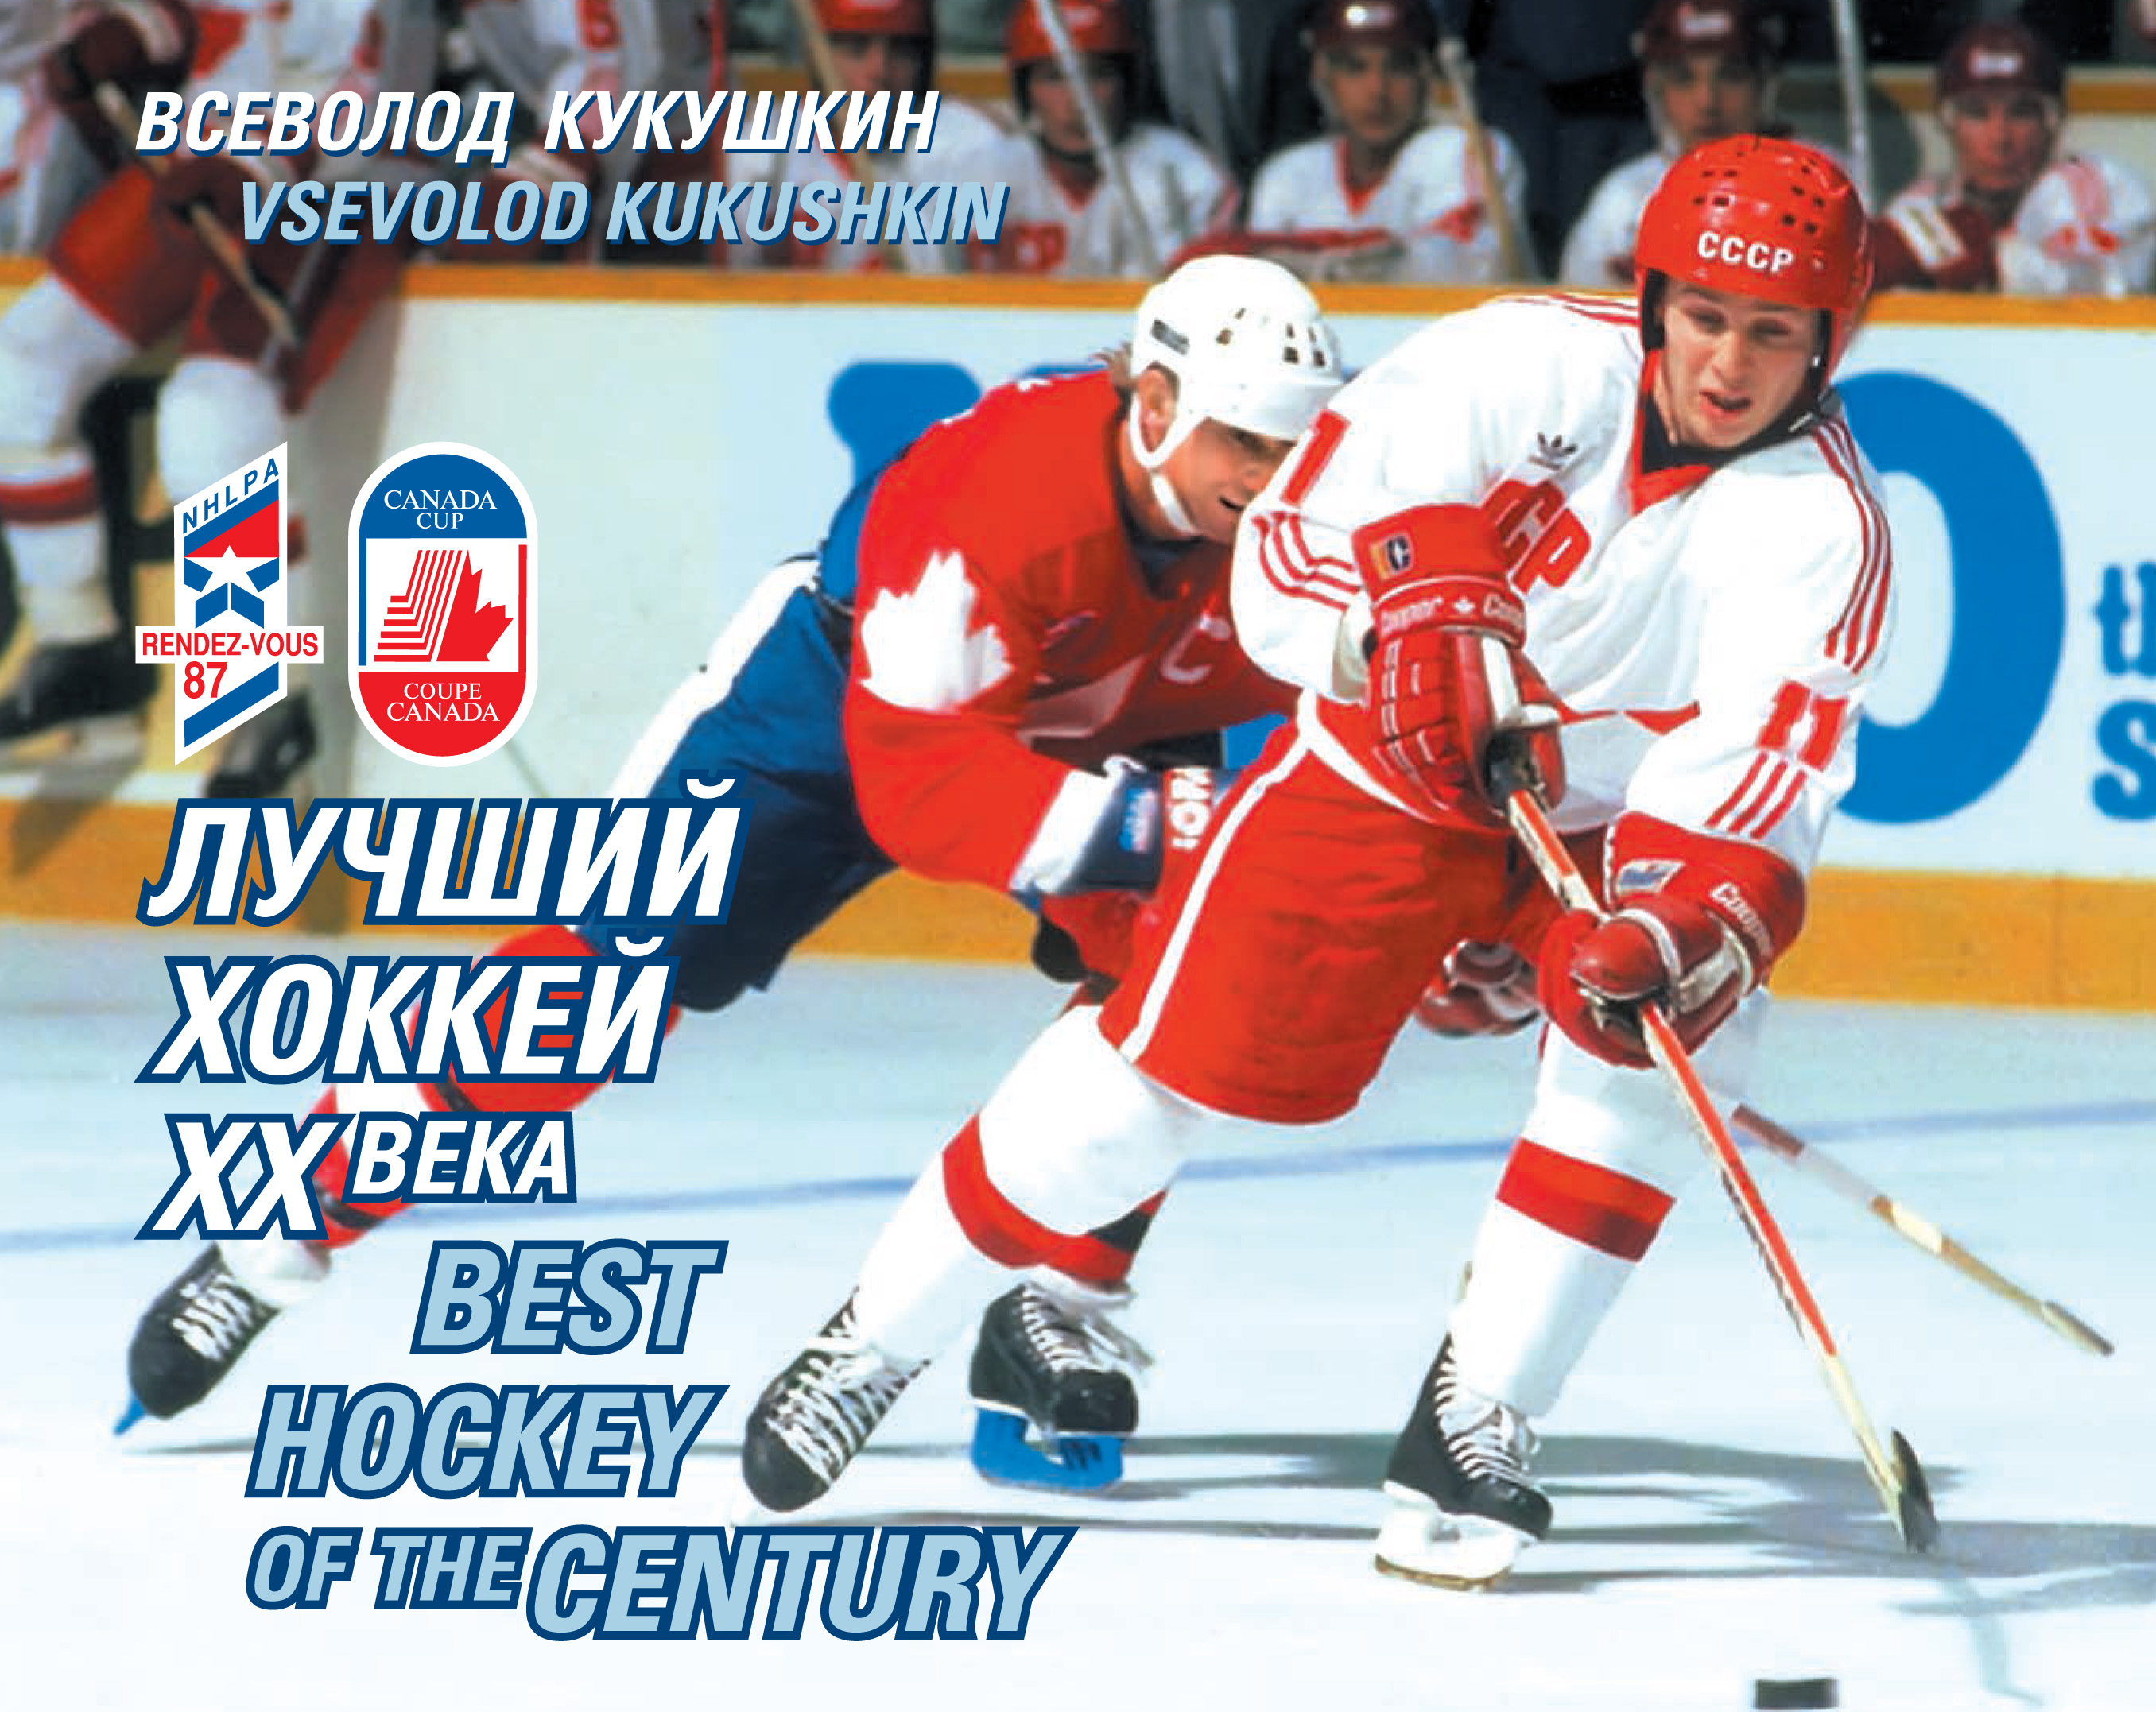 Всеволод Кукушкин Лучший хоккей XX века кукушкин в лучший хоккей xx века best hockey of the century